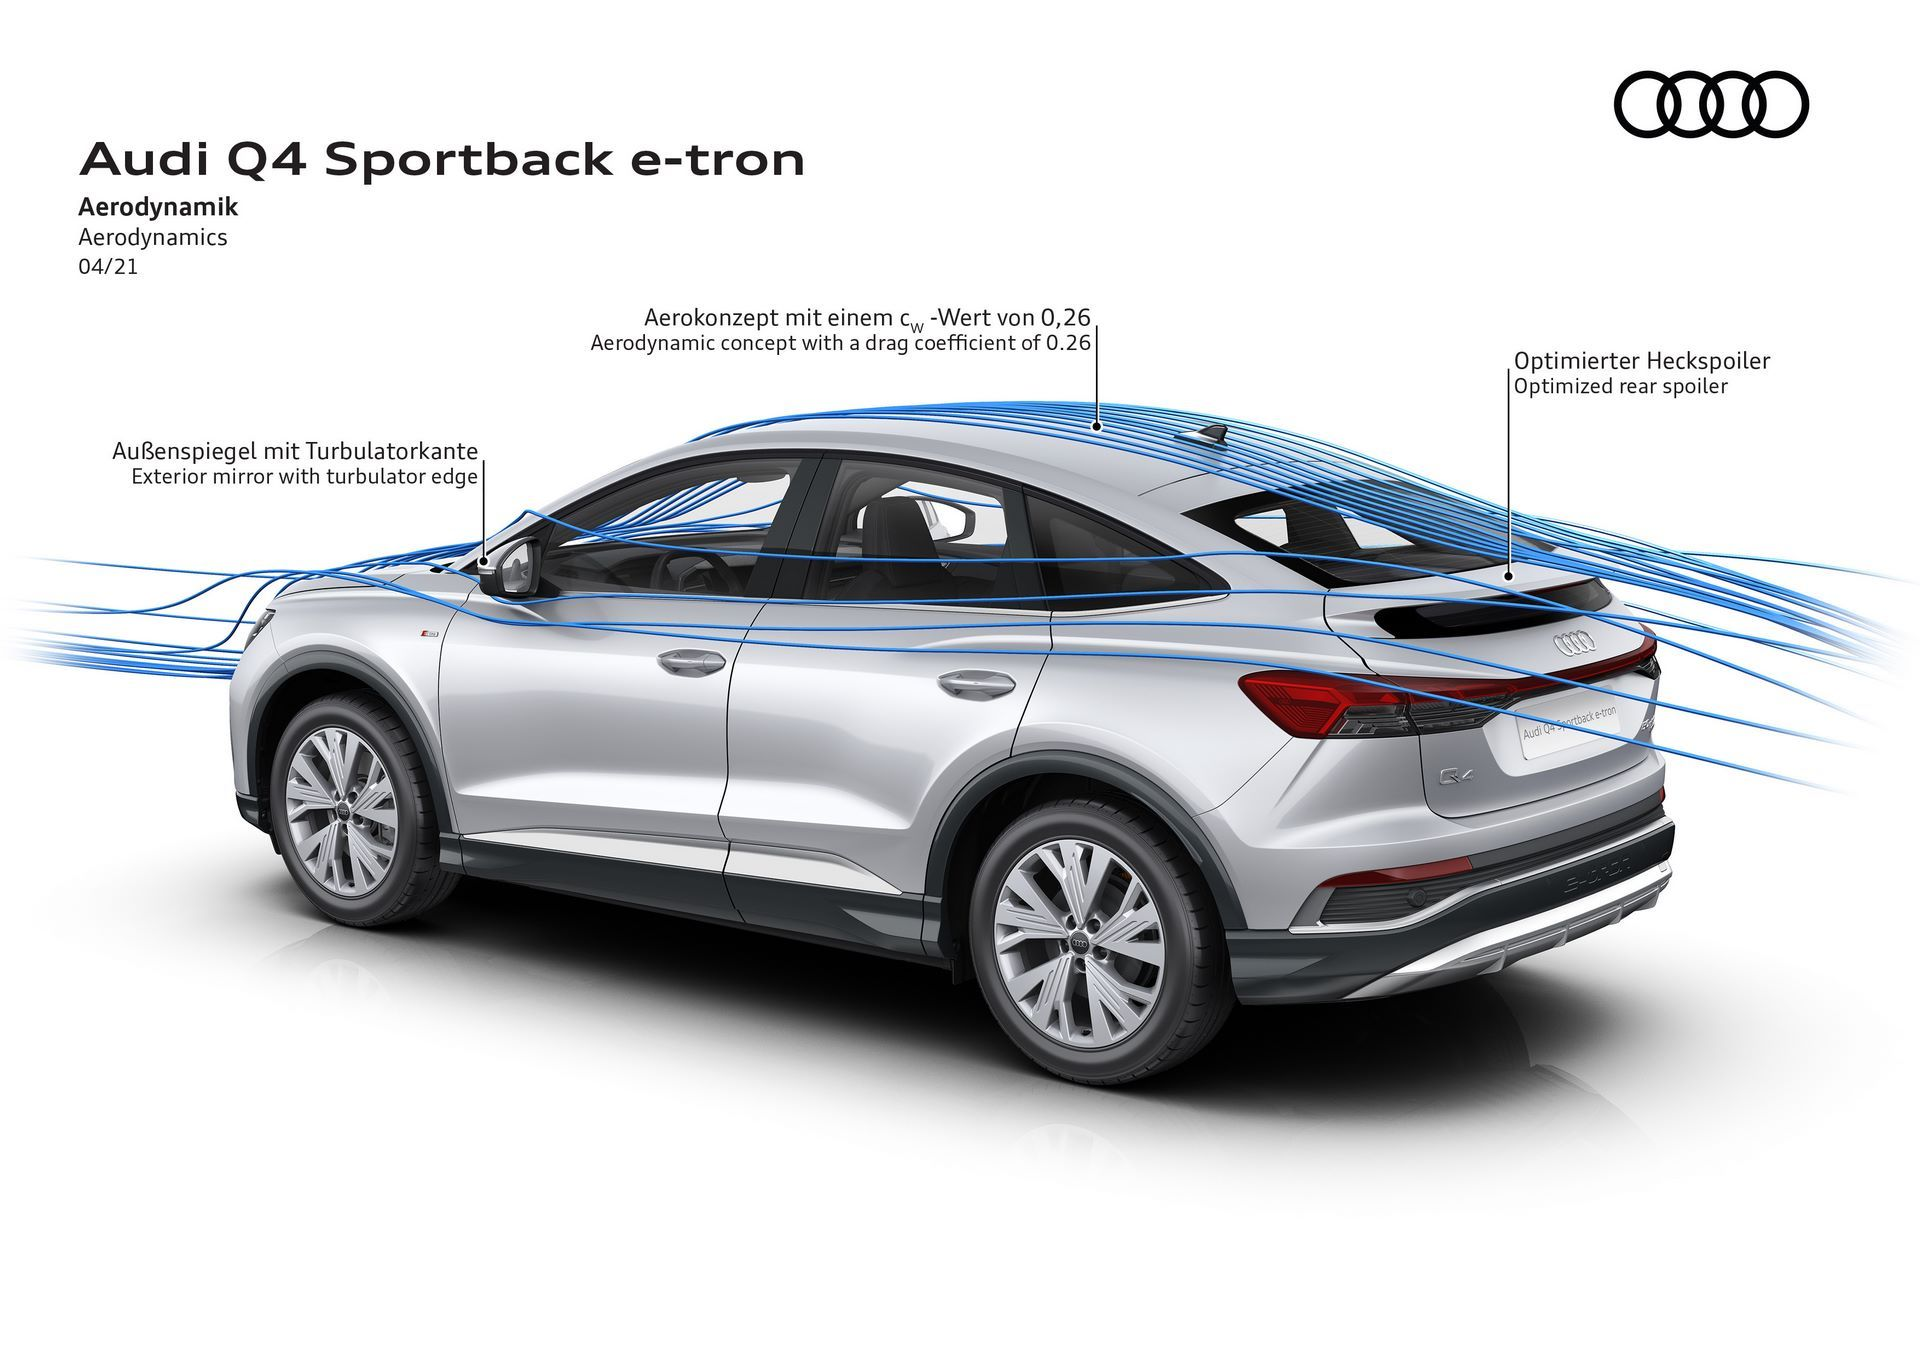 Audi-Q4-e-tron-and-Q4-e-tron-Sportback-158